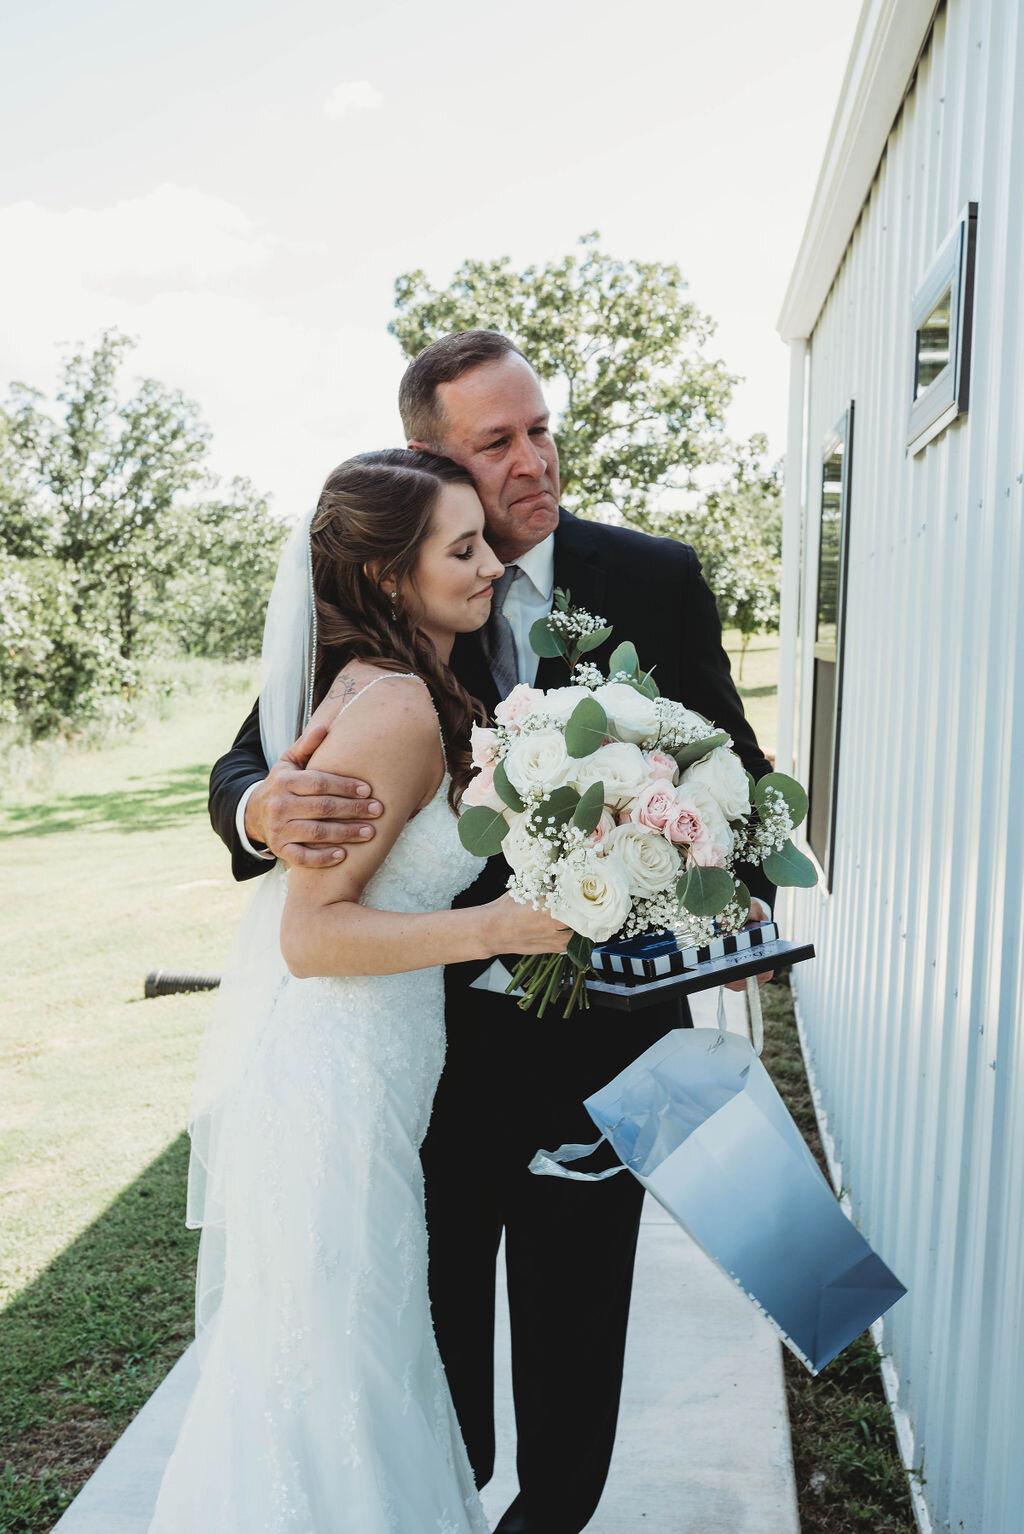 Tulsa Wedding Venue with a View 2.jpg